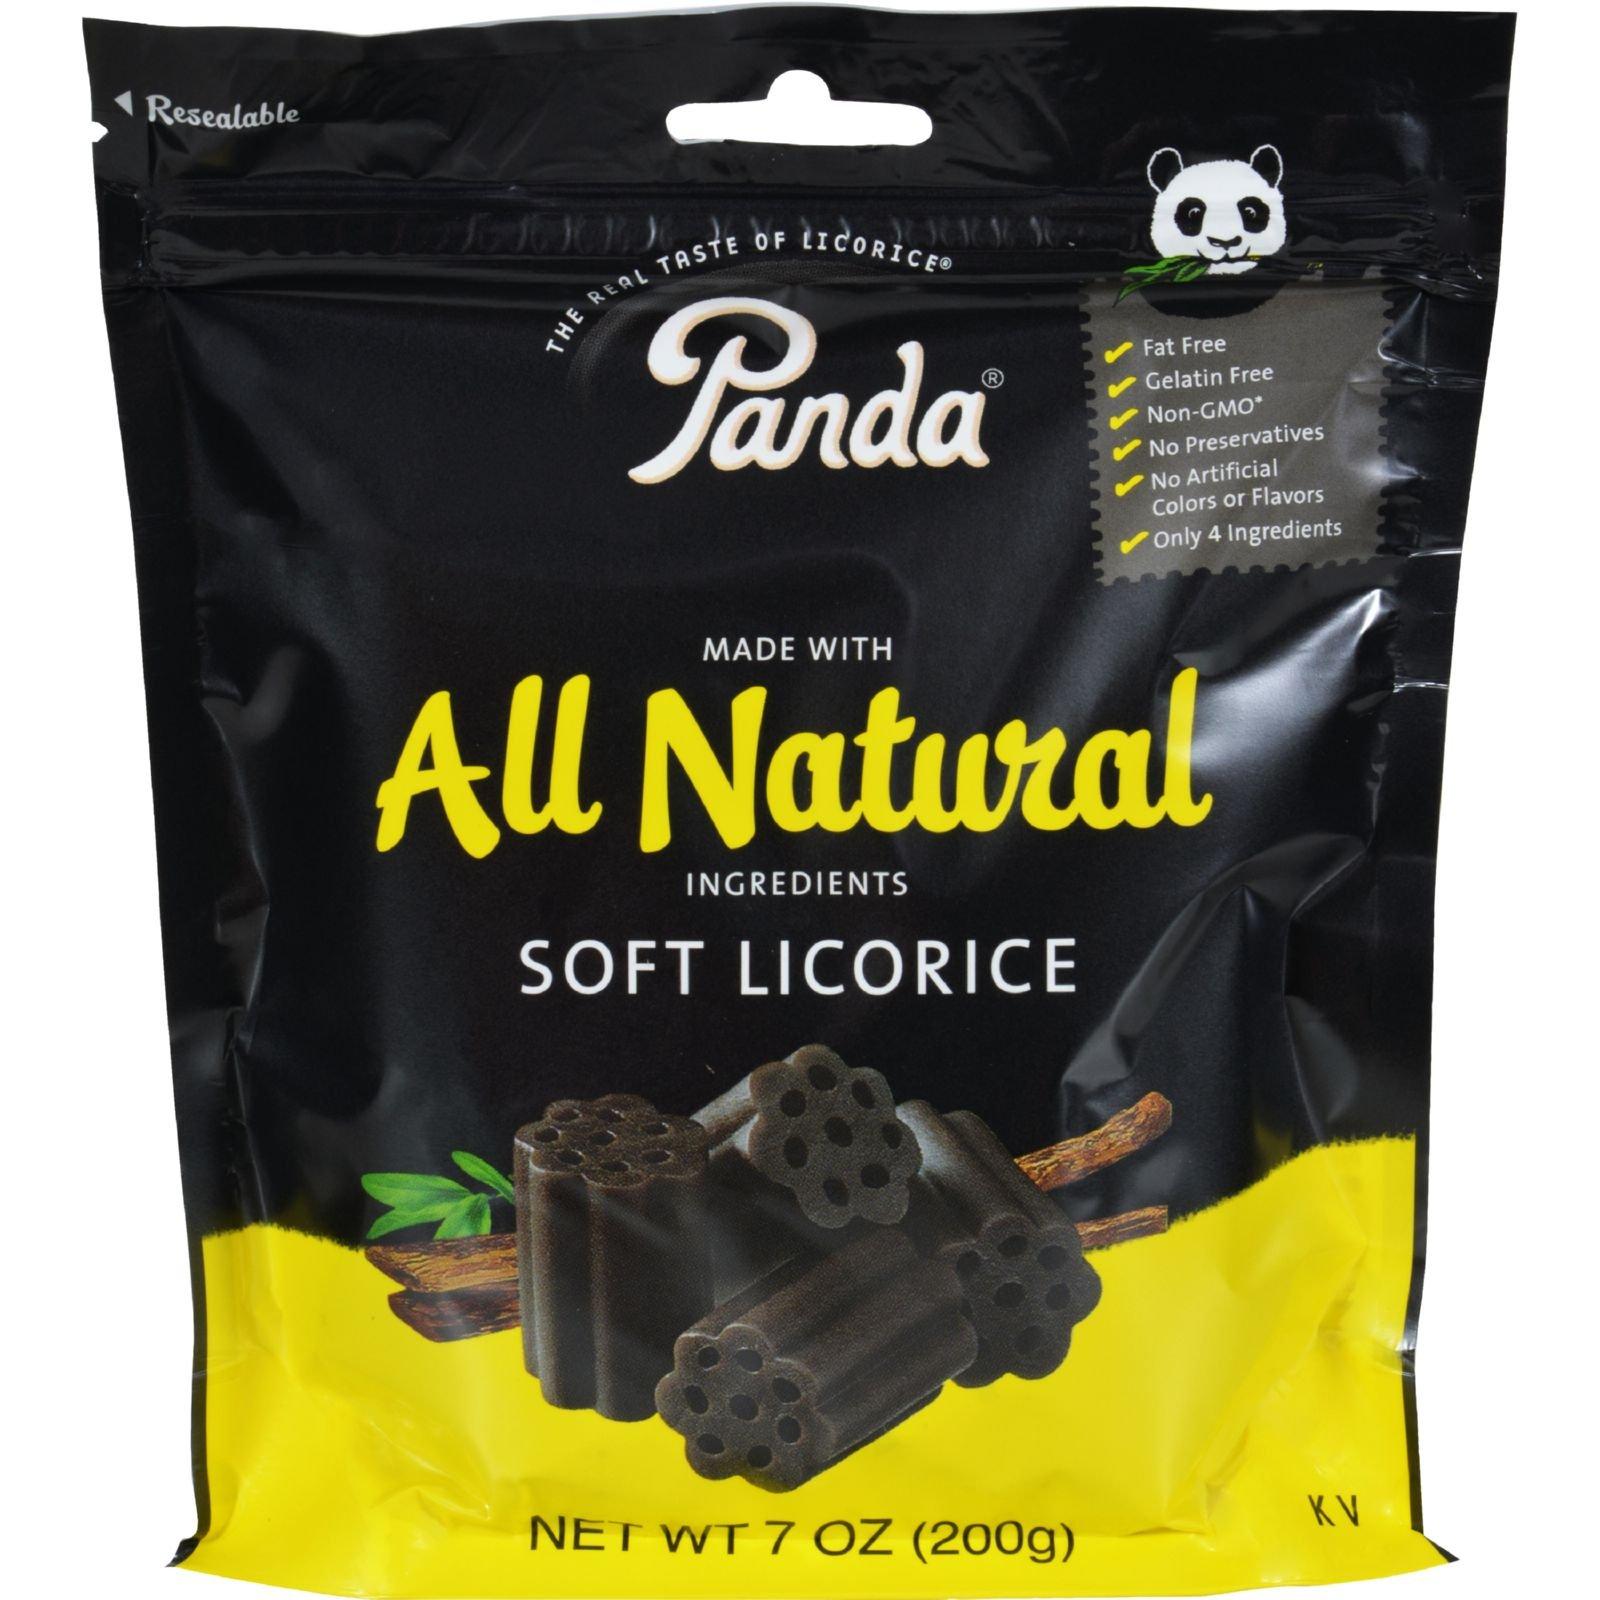 Panda All Natural Soft Licorice, 7 Oz.